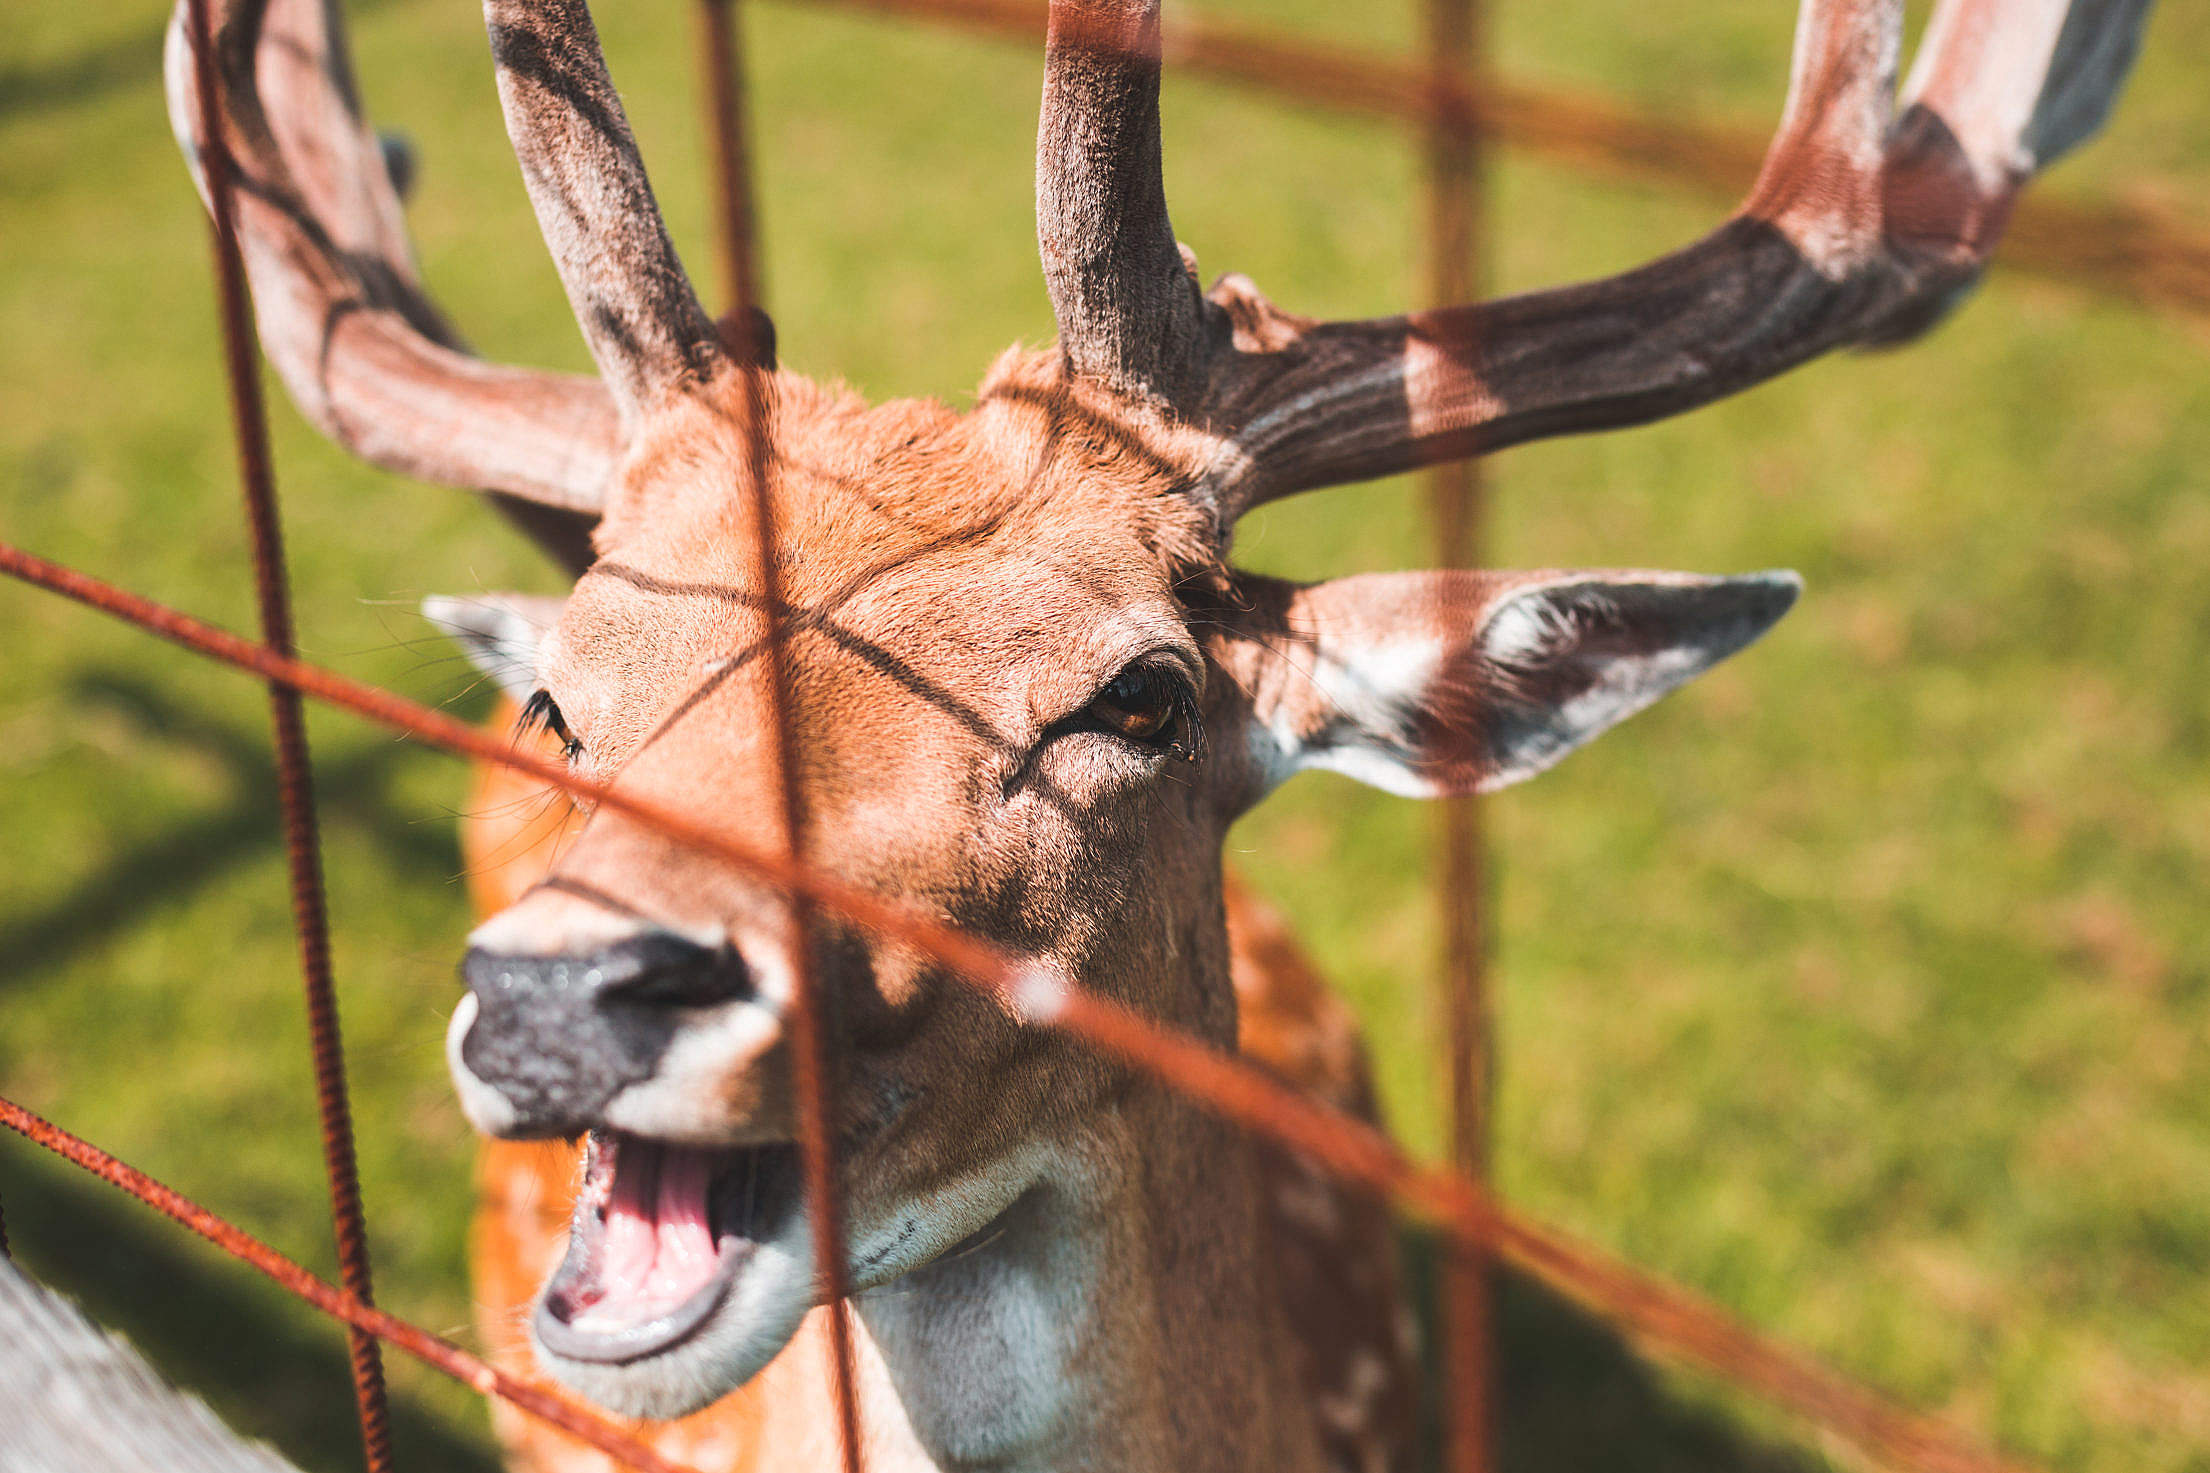 Happy Deer Free Stock Photo